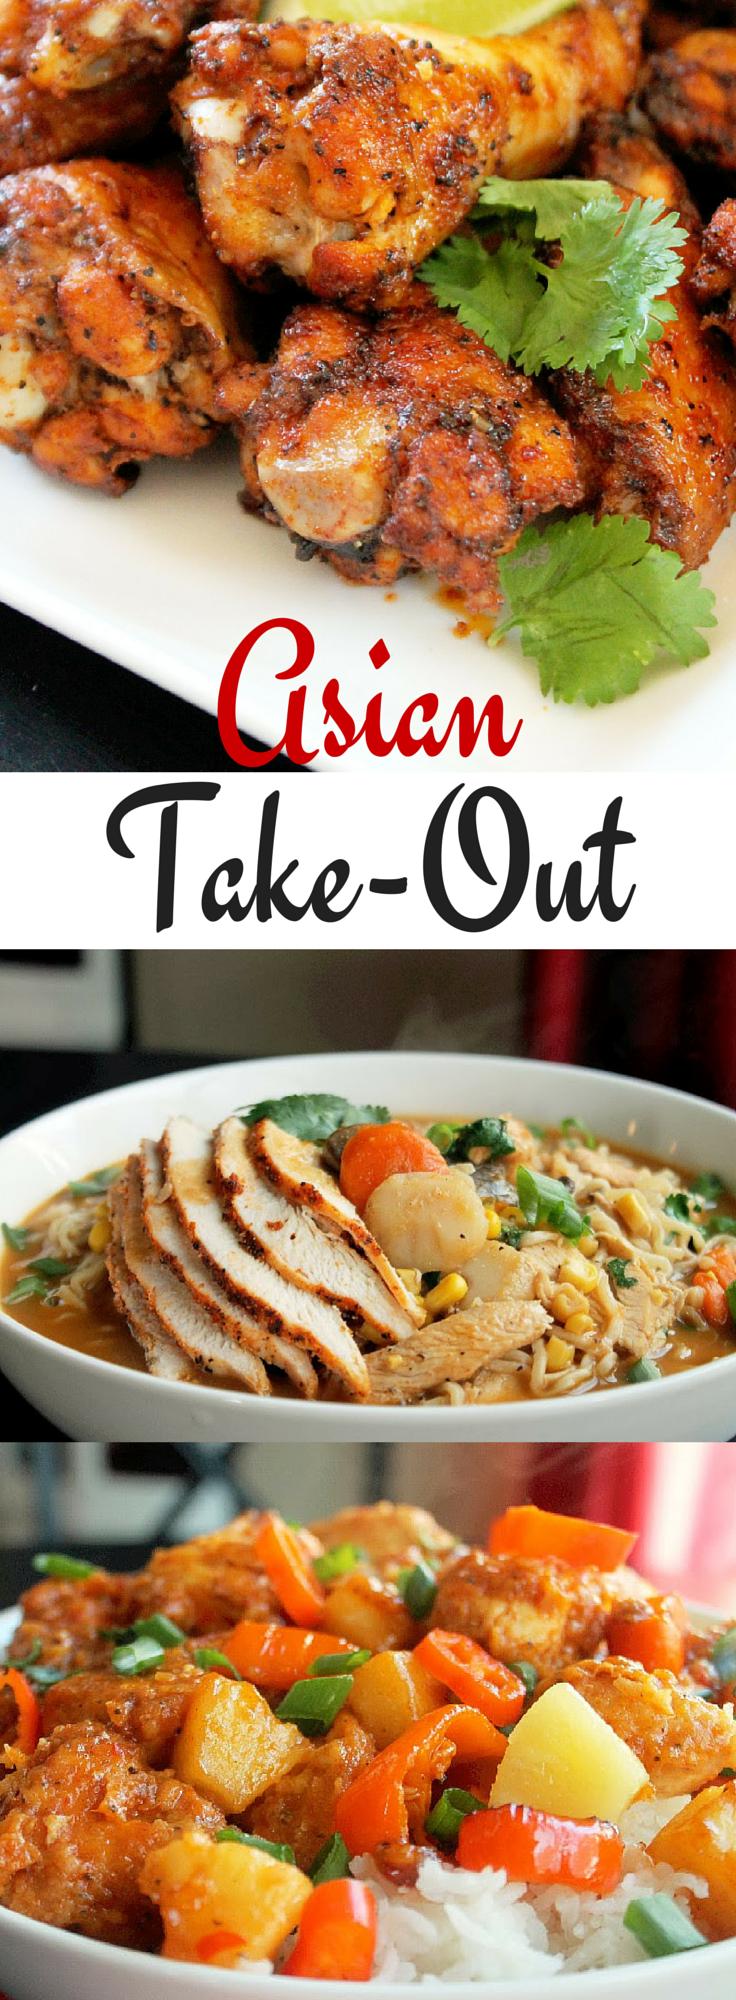 Asian Take Out-Creole Contessa